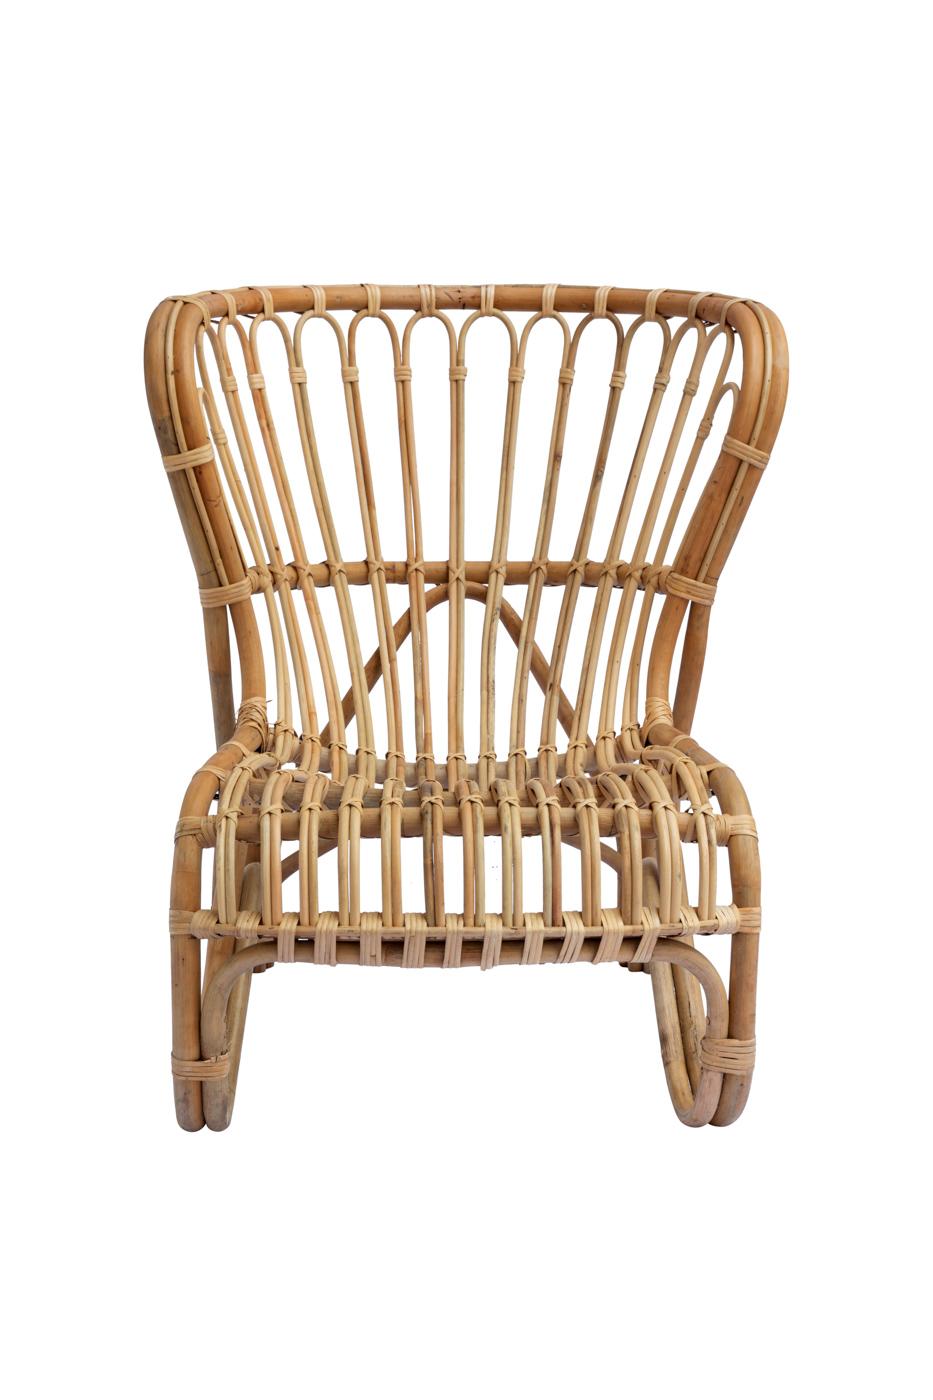 Sien chair in rattan